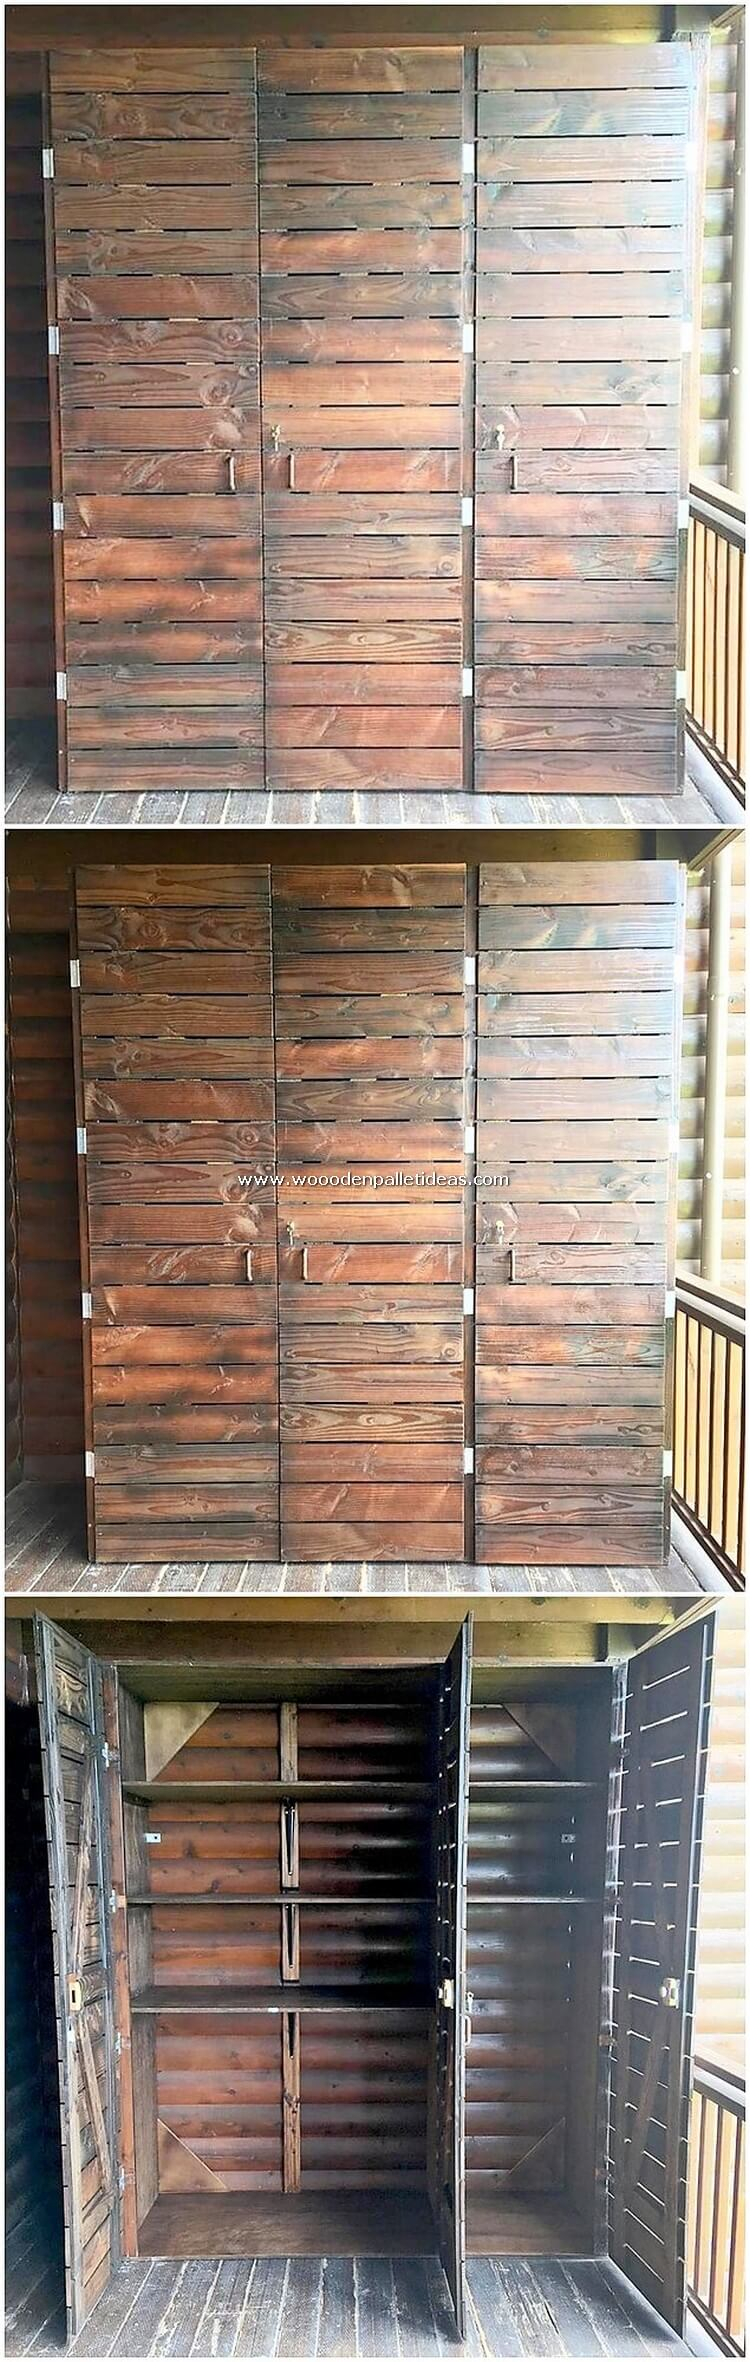 Pallet-Wardrobe-or-Closet